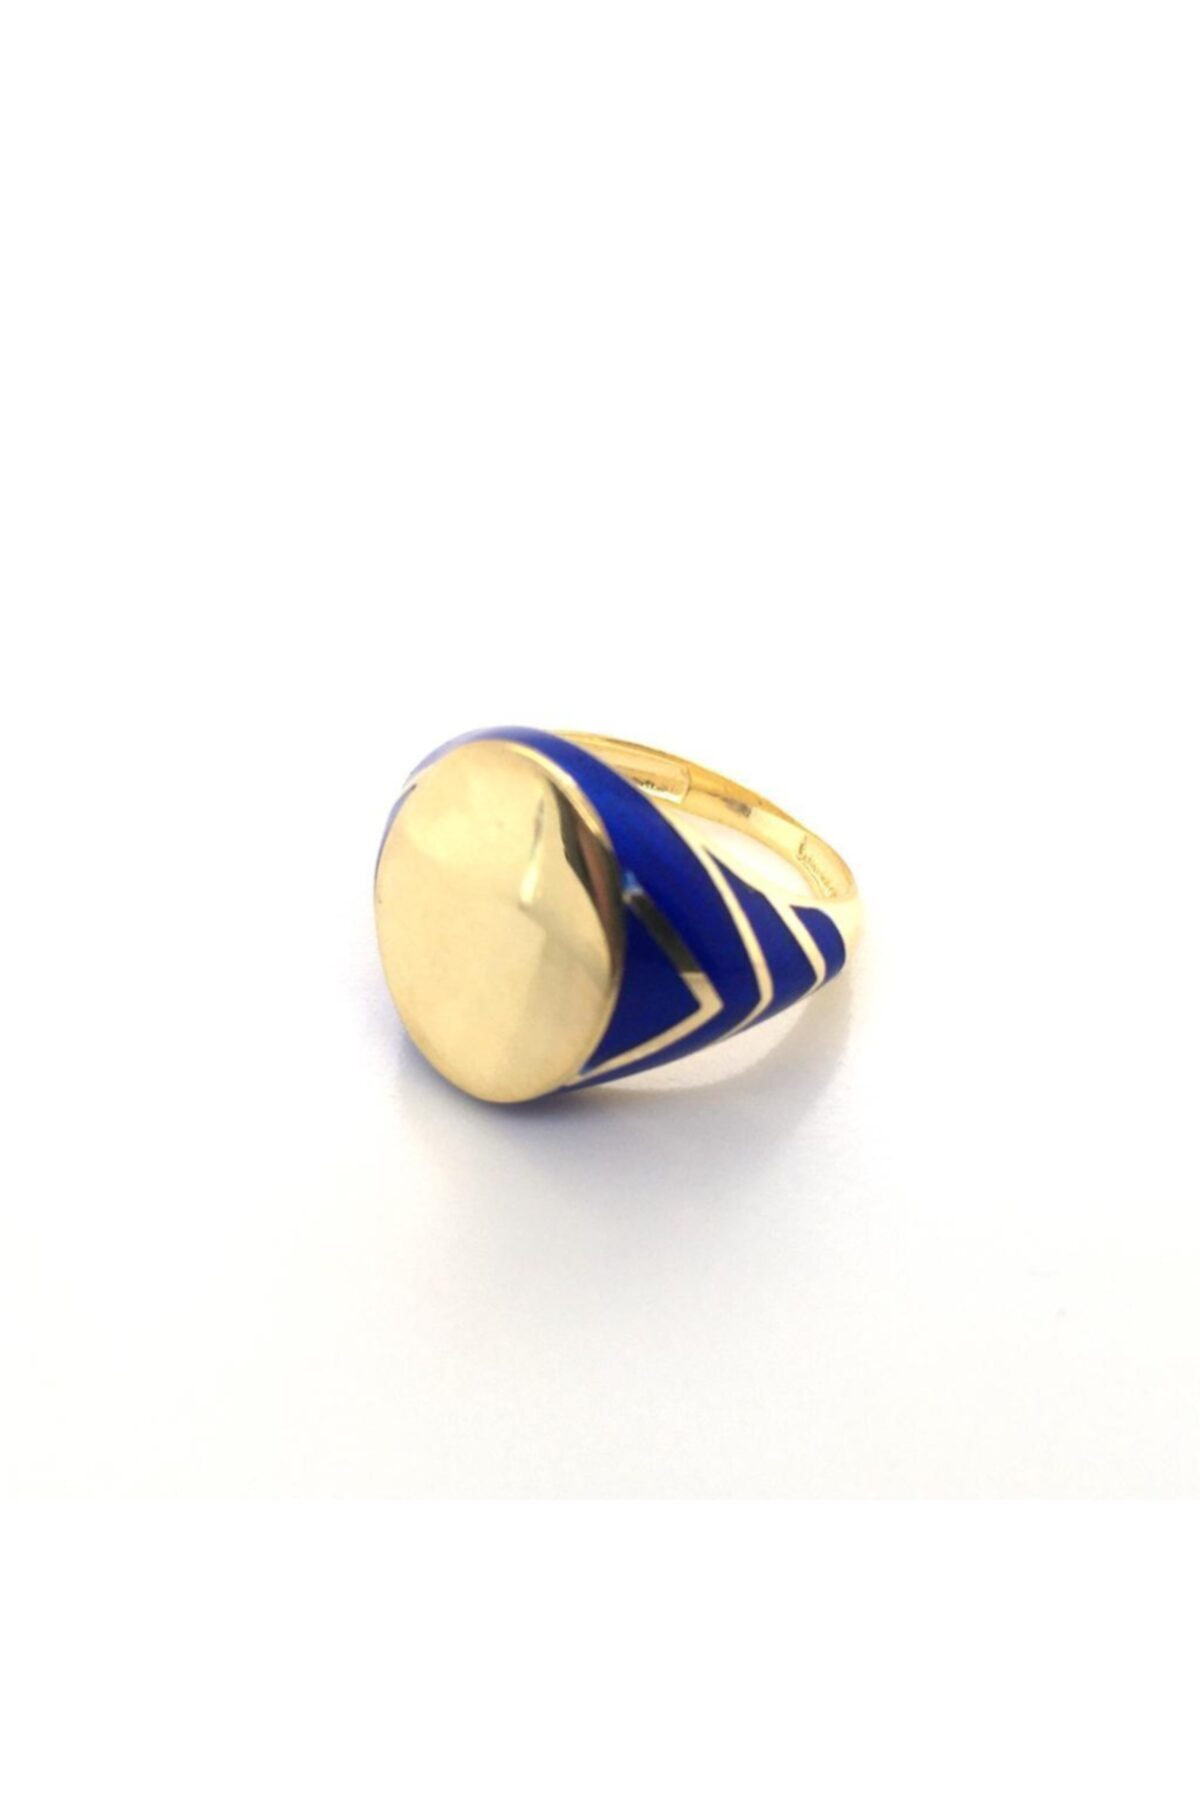 Luzdemia Colorfull Yzk 925 - # 8 Boy - Mavi 1